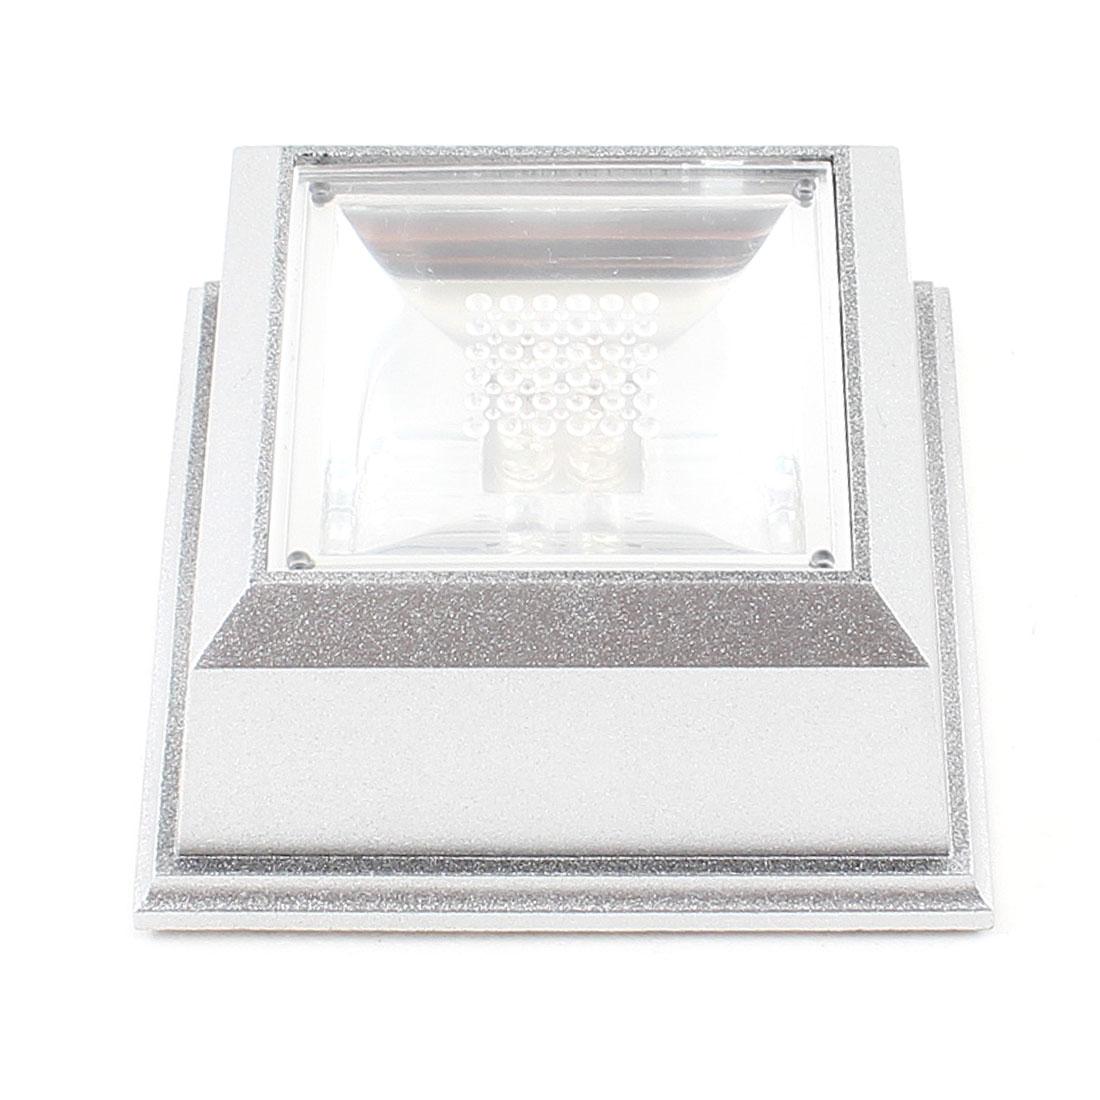 Bedroom Decor Color Squared Plastic Crystal Display Base Stand LED Light